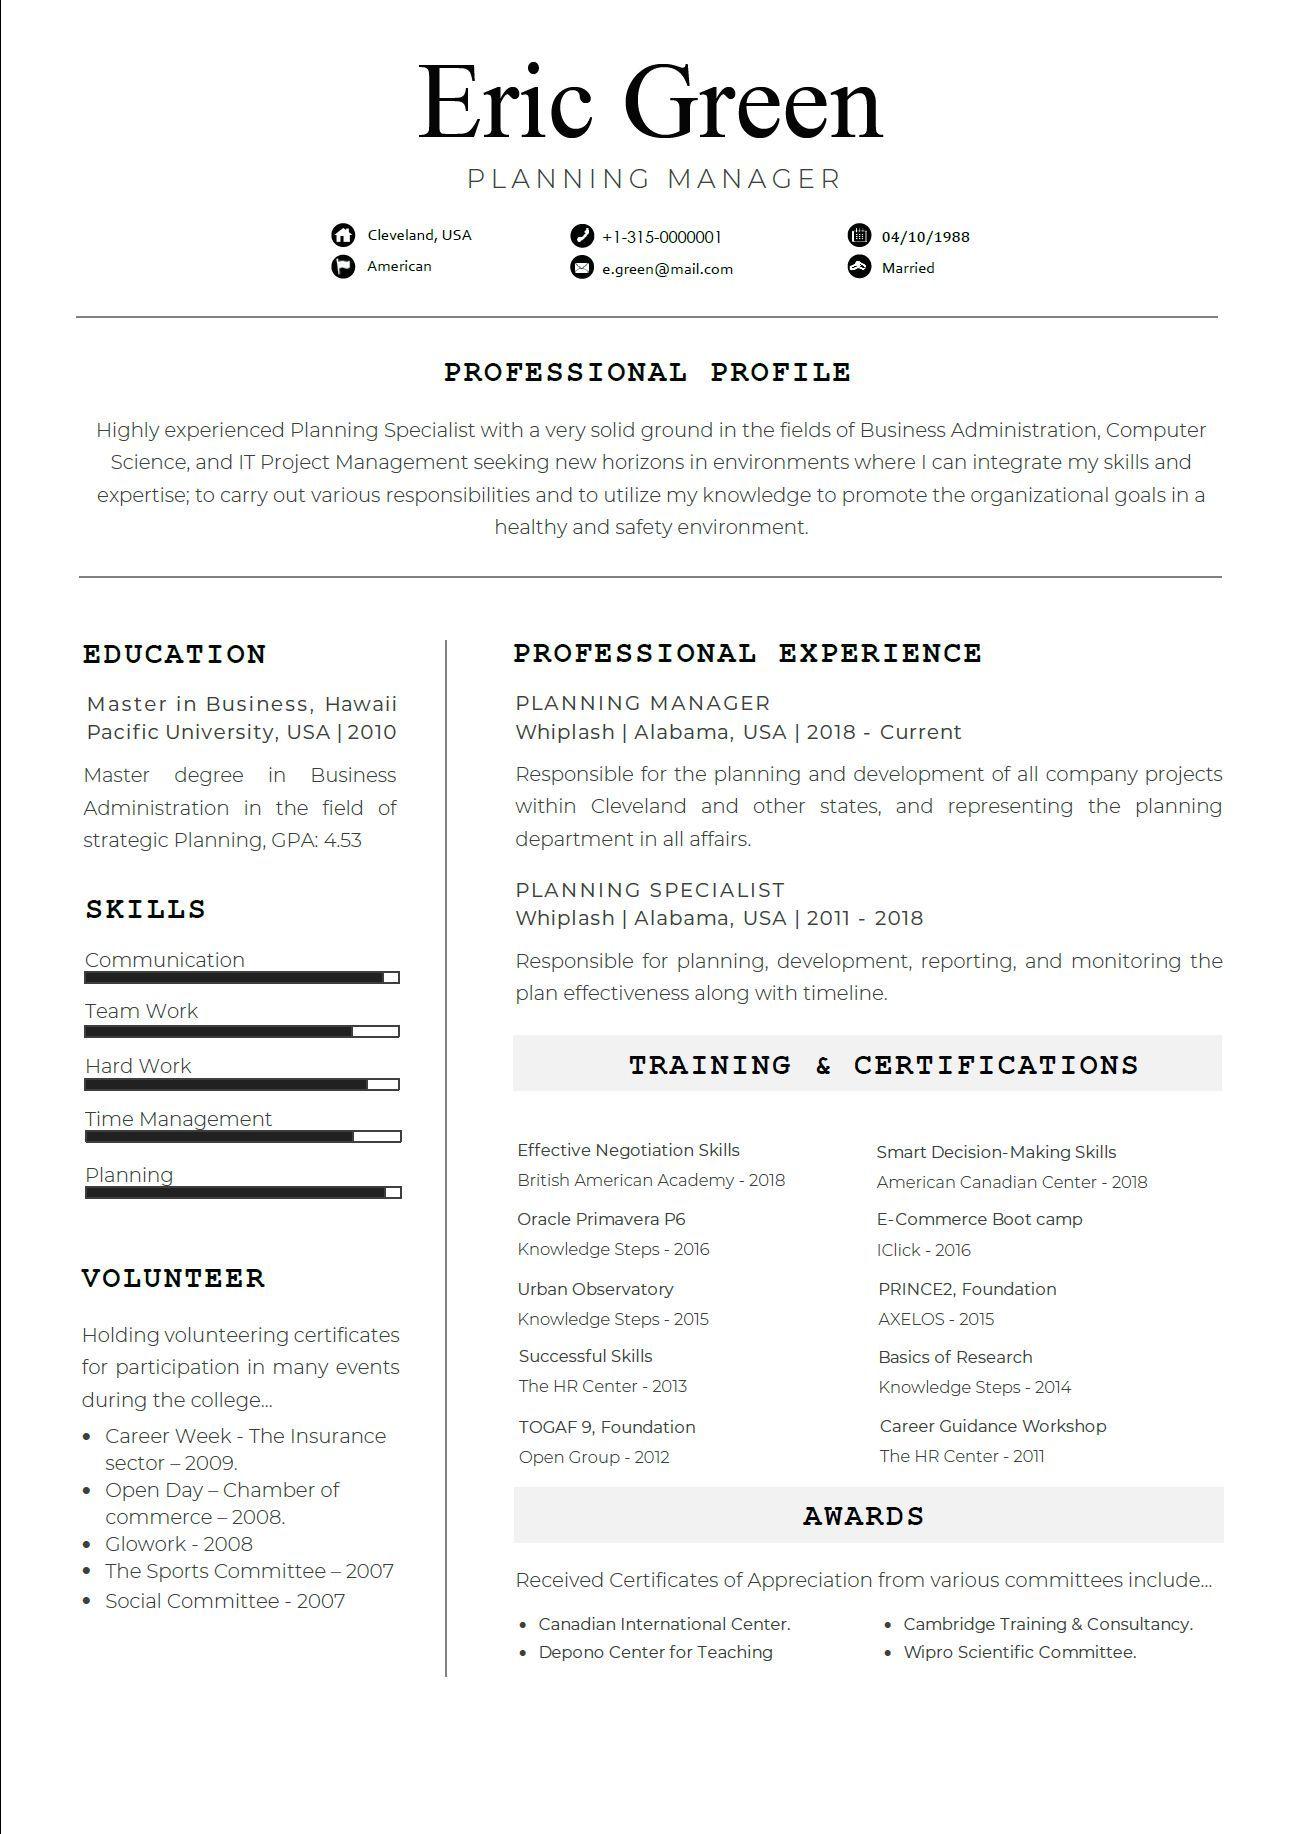 Resume template Consilio Professional Resume Template